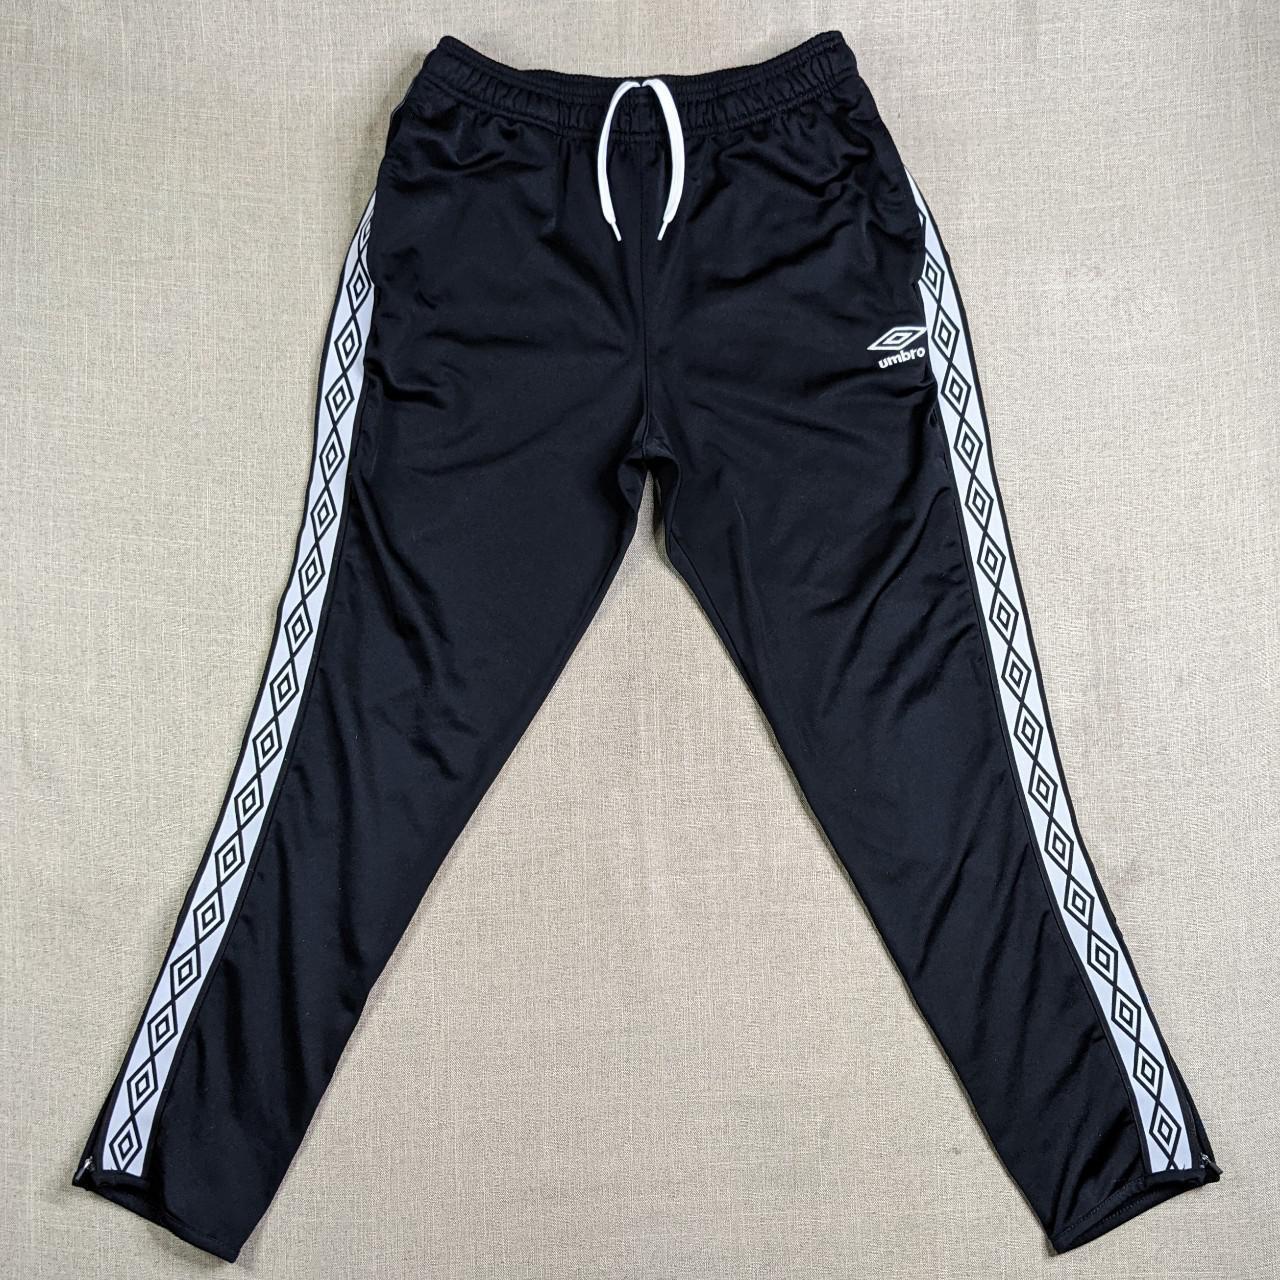 Product Image 1 - Umbro track pants / sweatpants